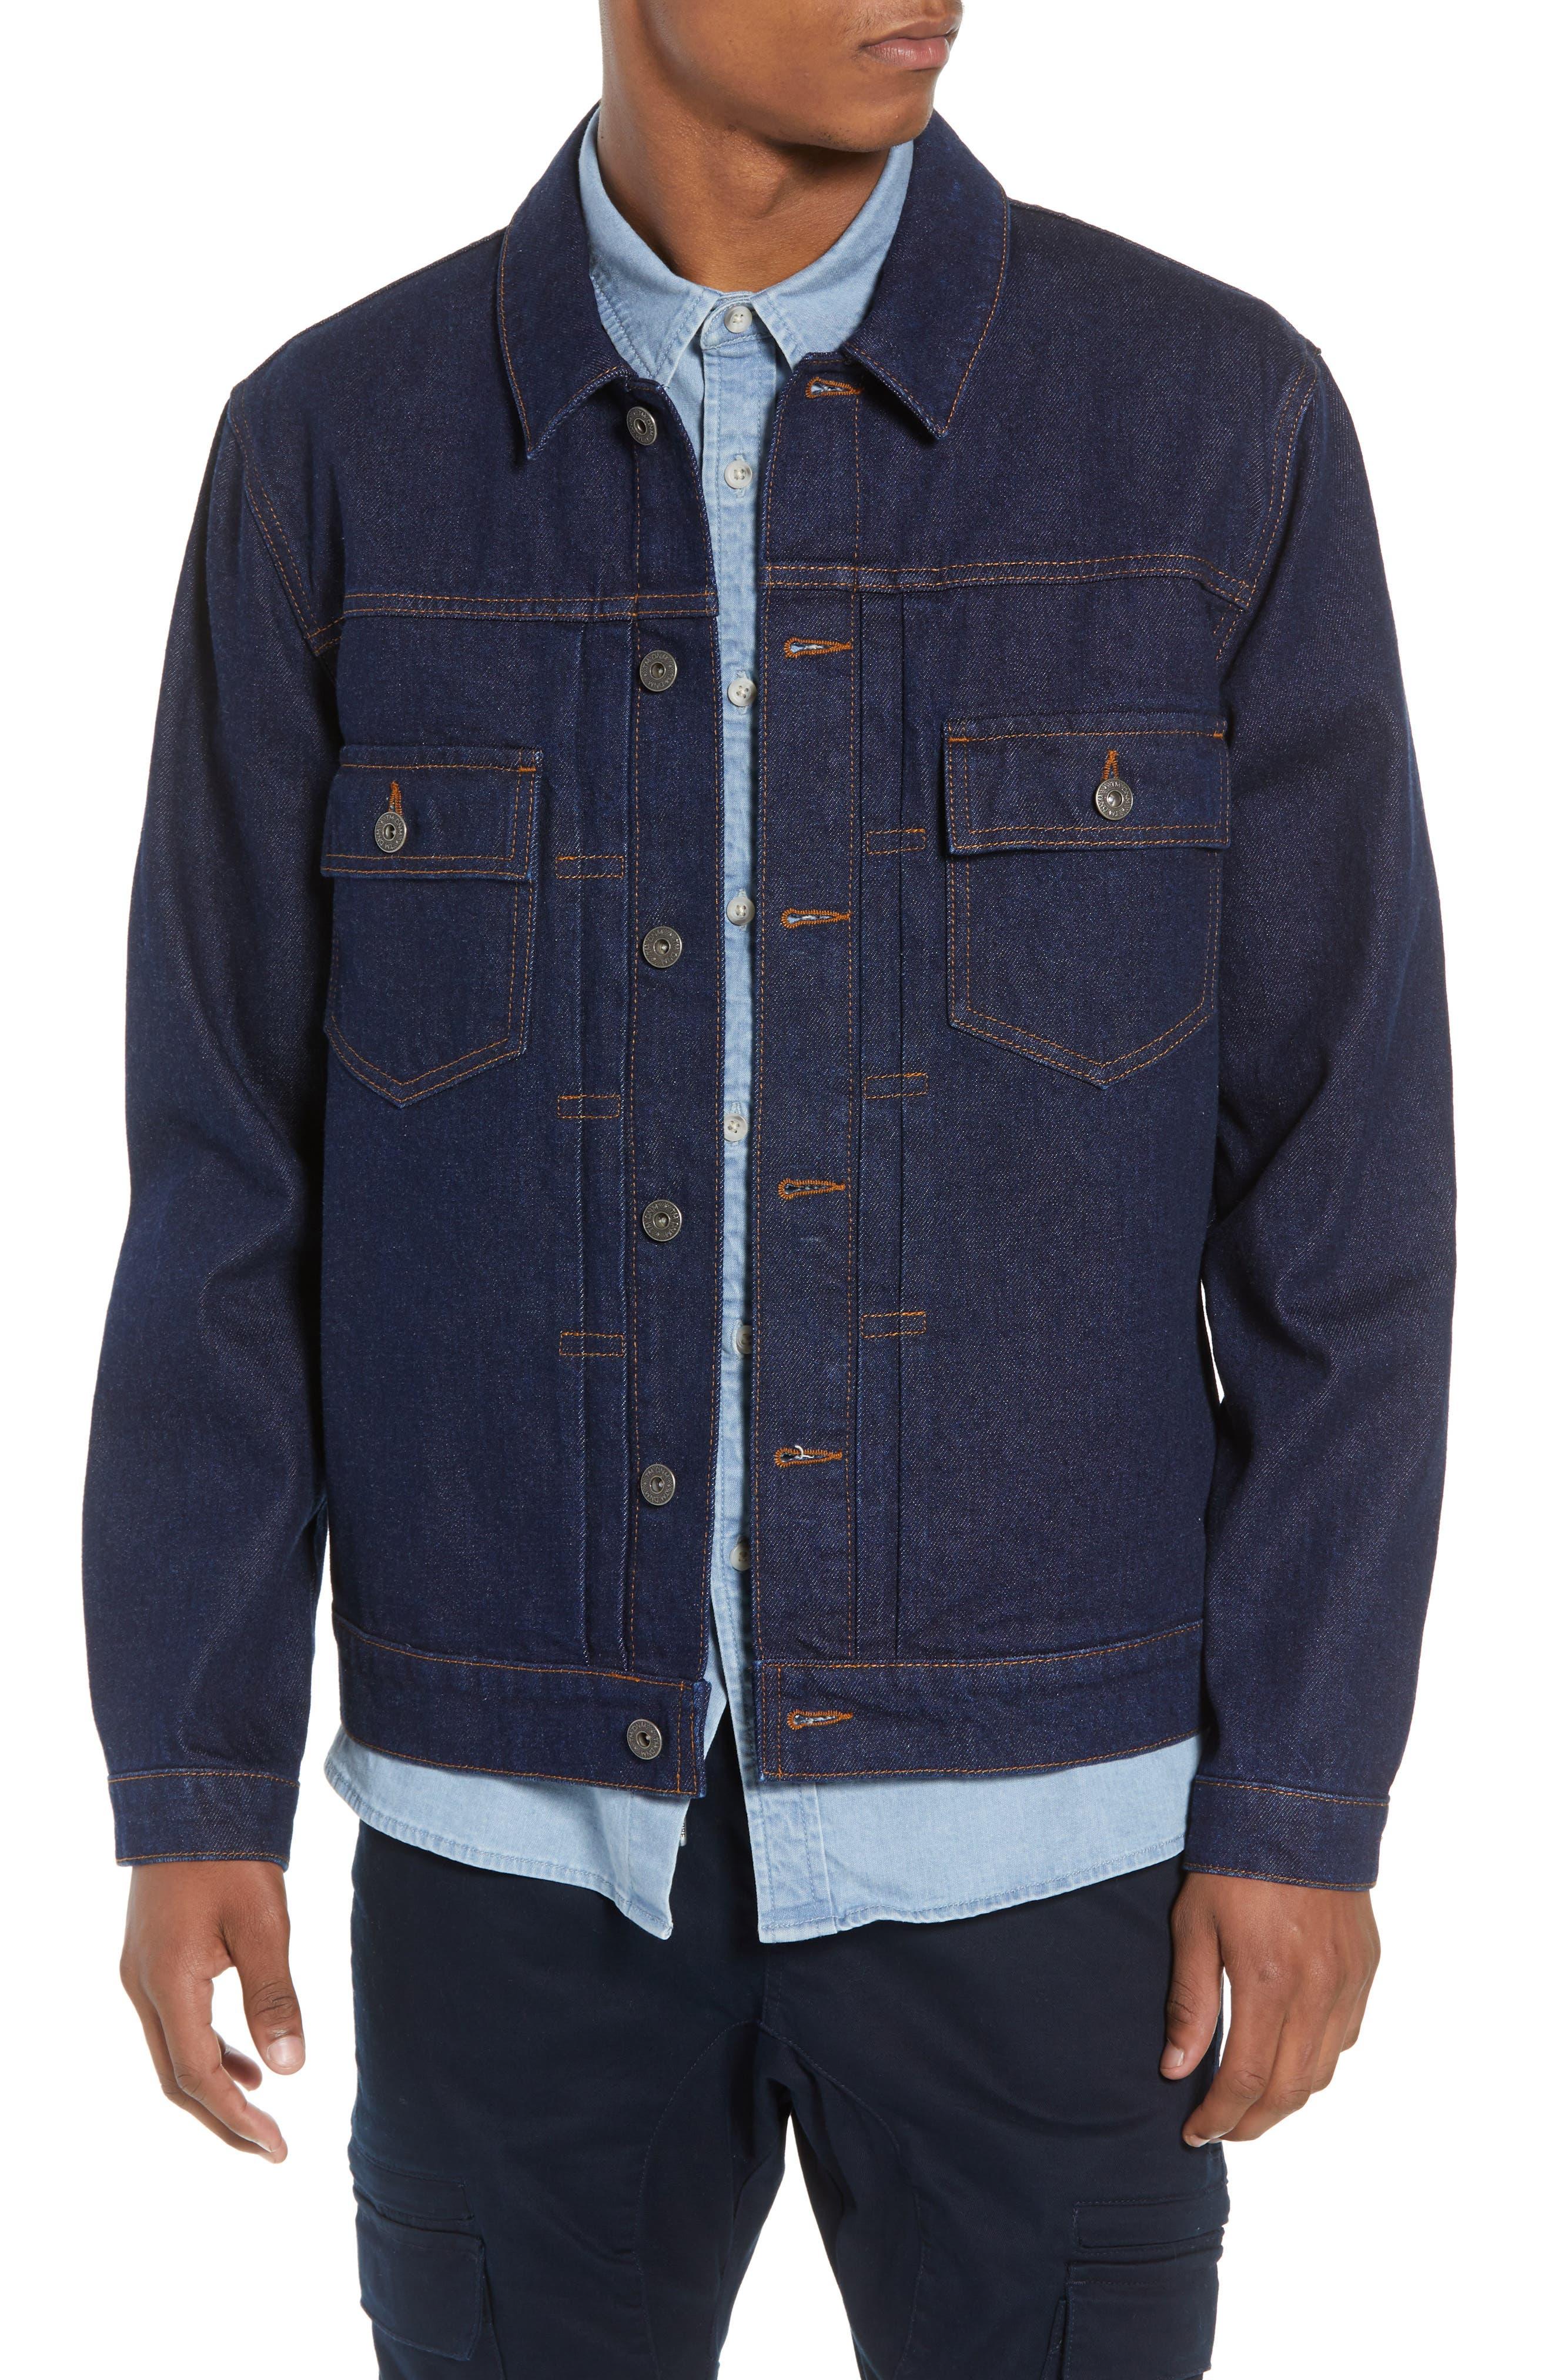 Raw Denim Jacket,                             Main thumbnail 1, color,                             DARK BLUE